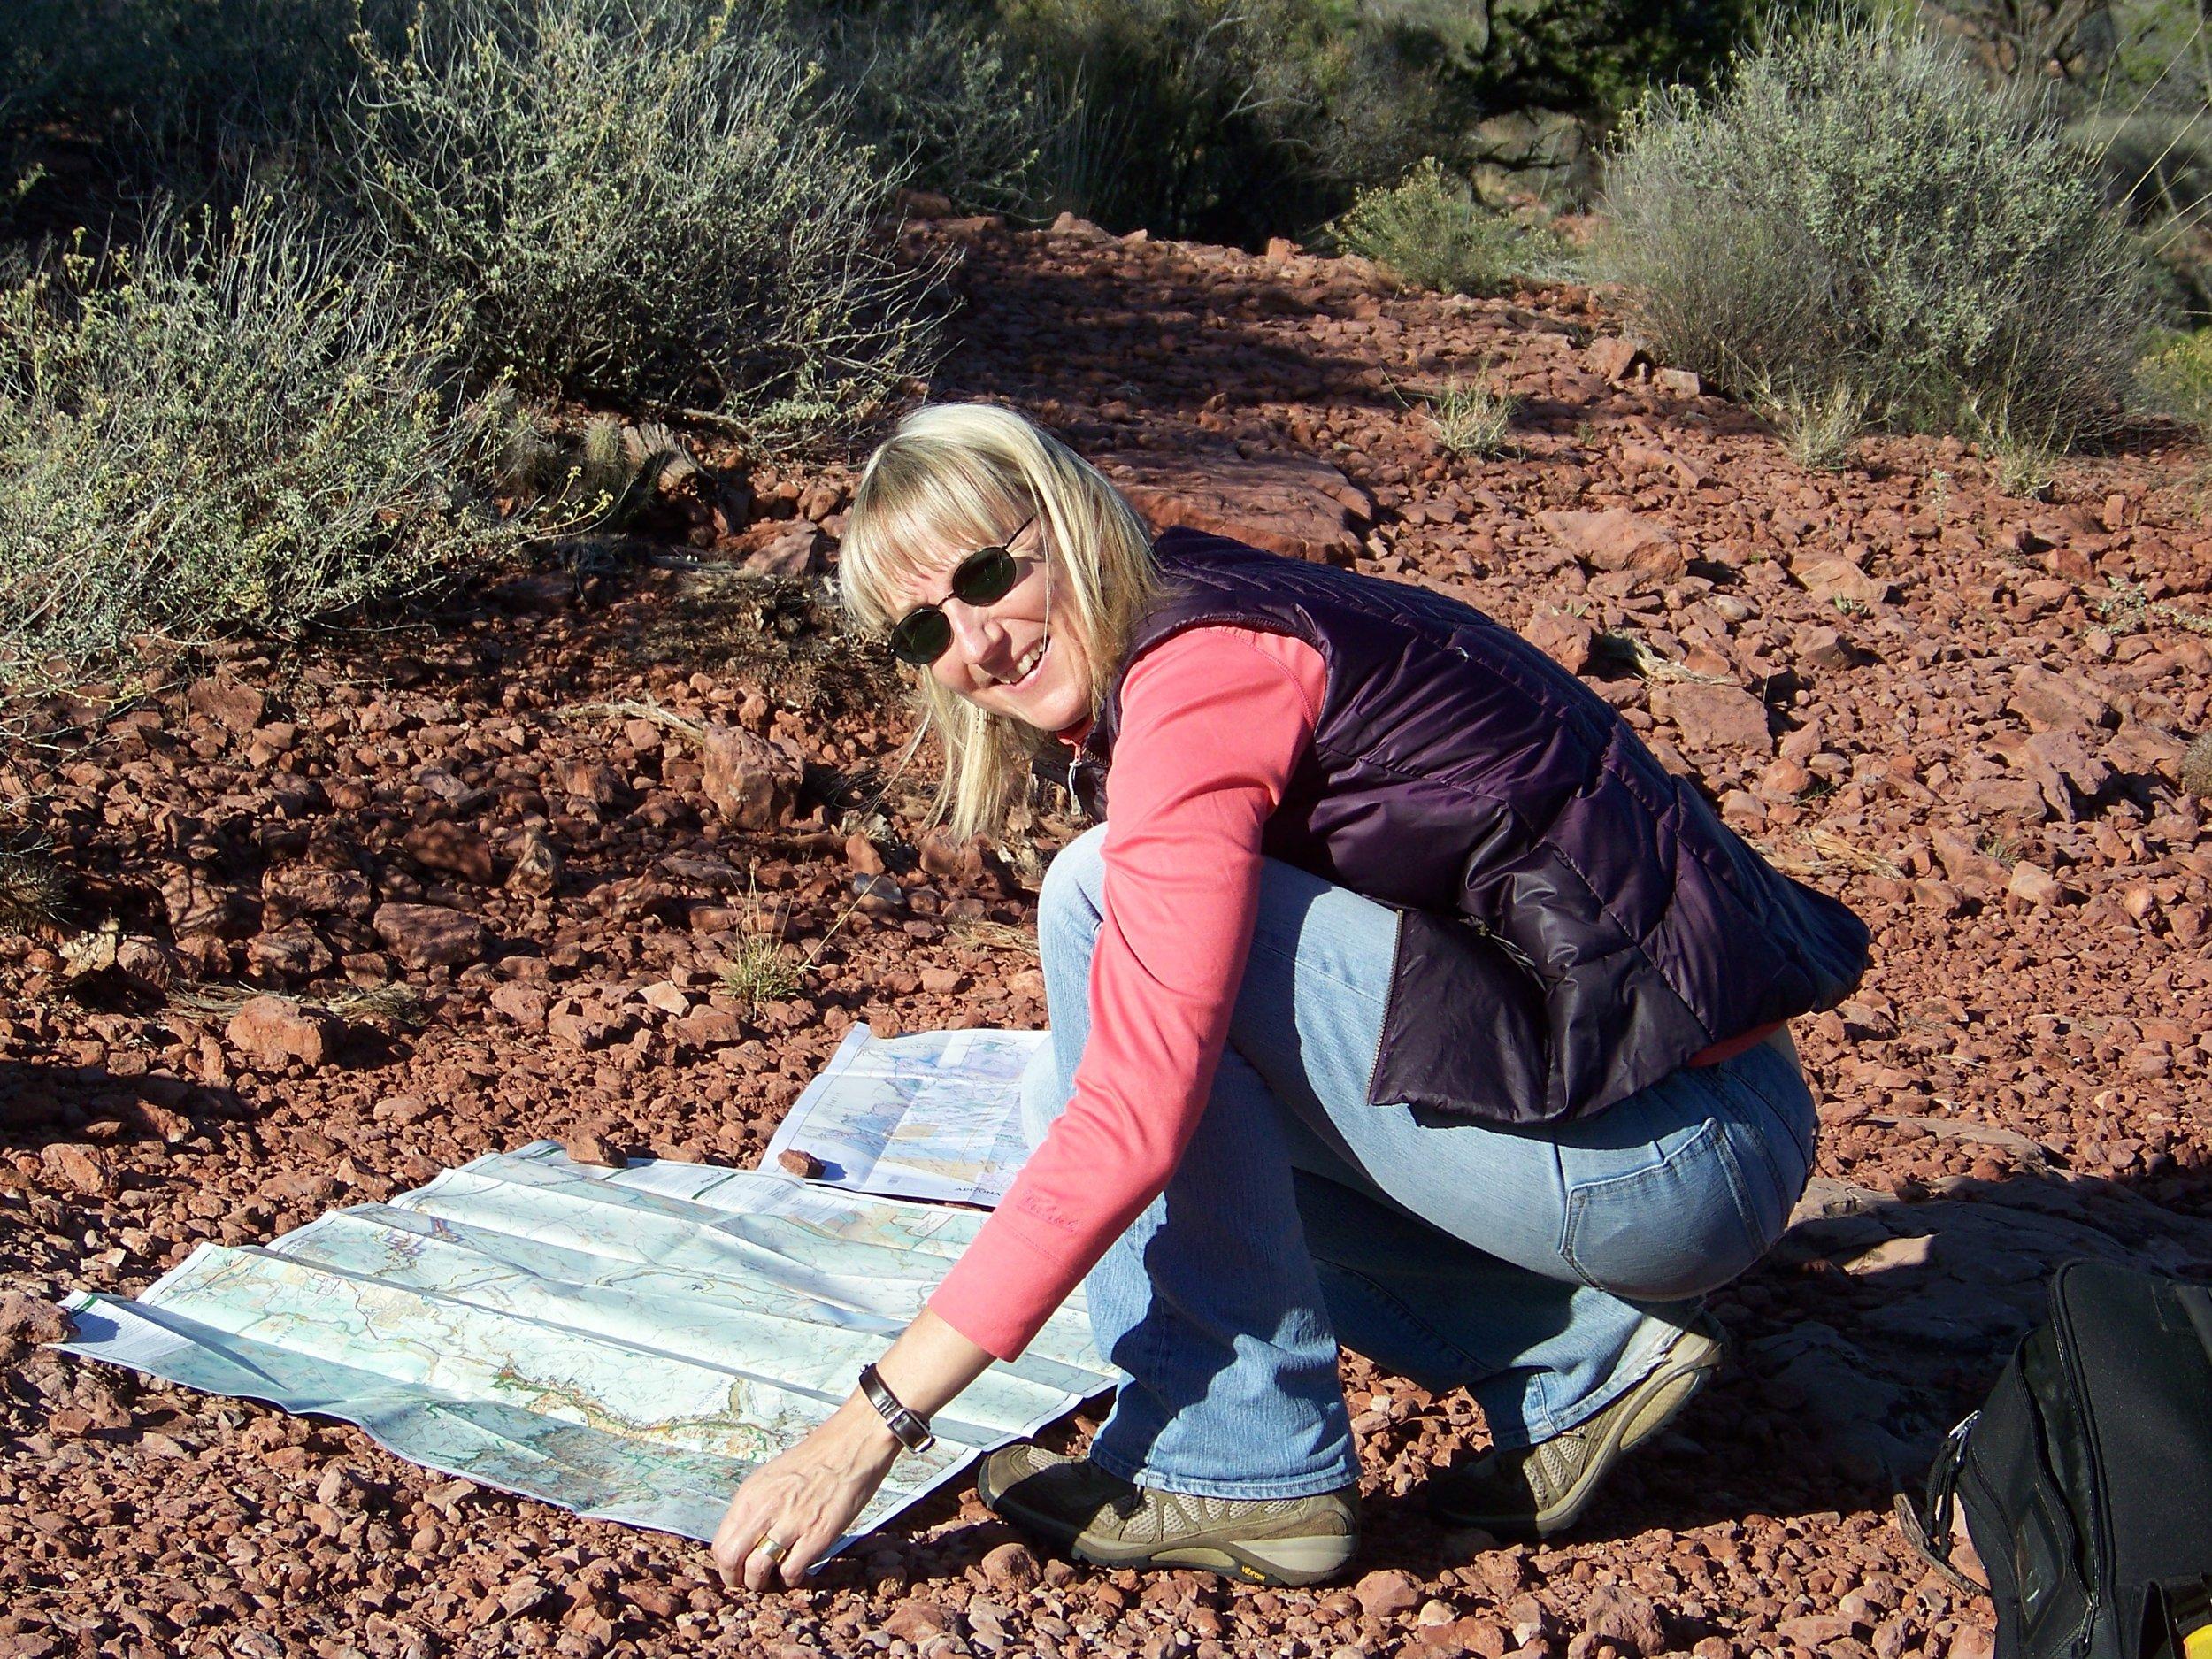 Carrie Ann setting up for a teaching Sedona 2016